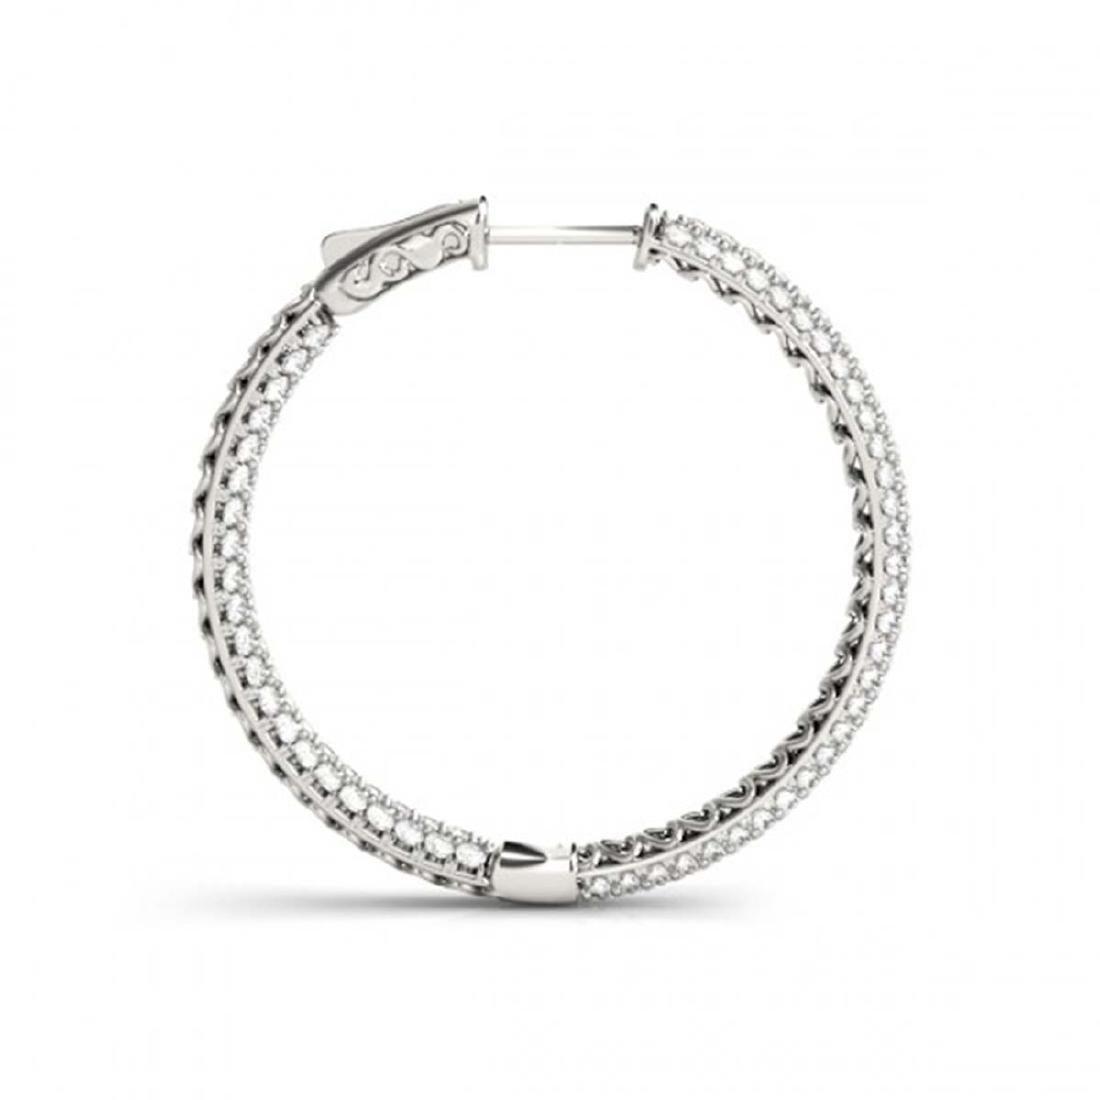 4.5 CTW Diamond VS/SI Certified 28 Mm Hoop Earrings 14K - 3